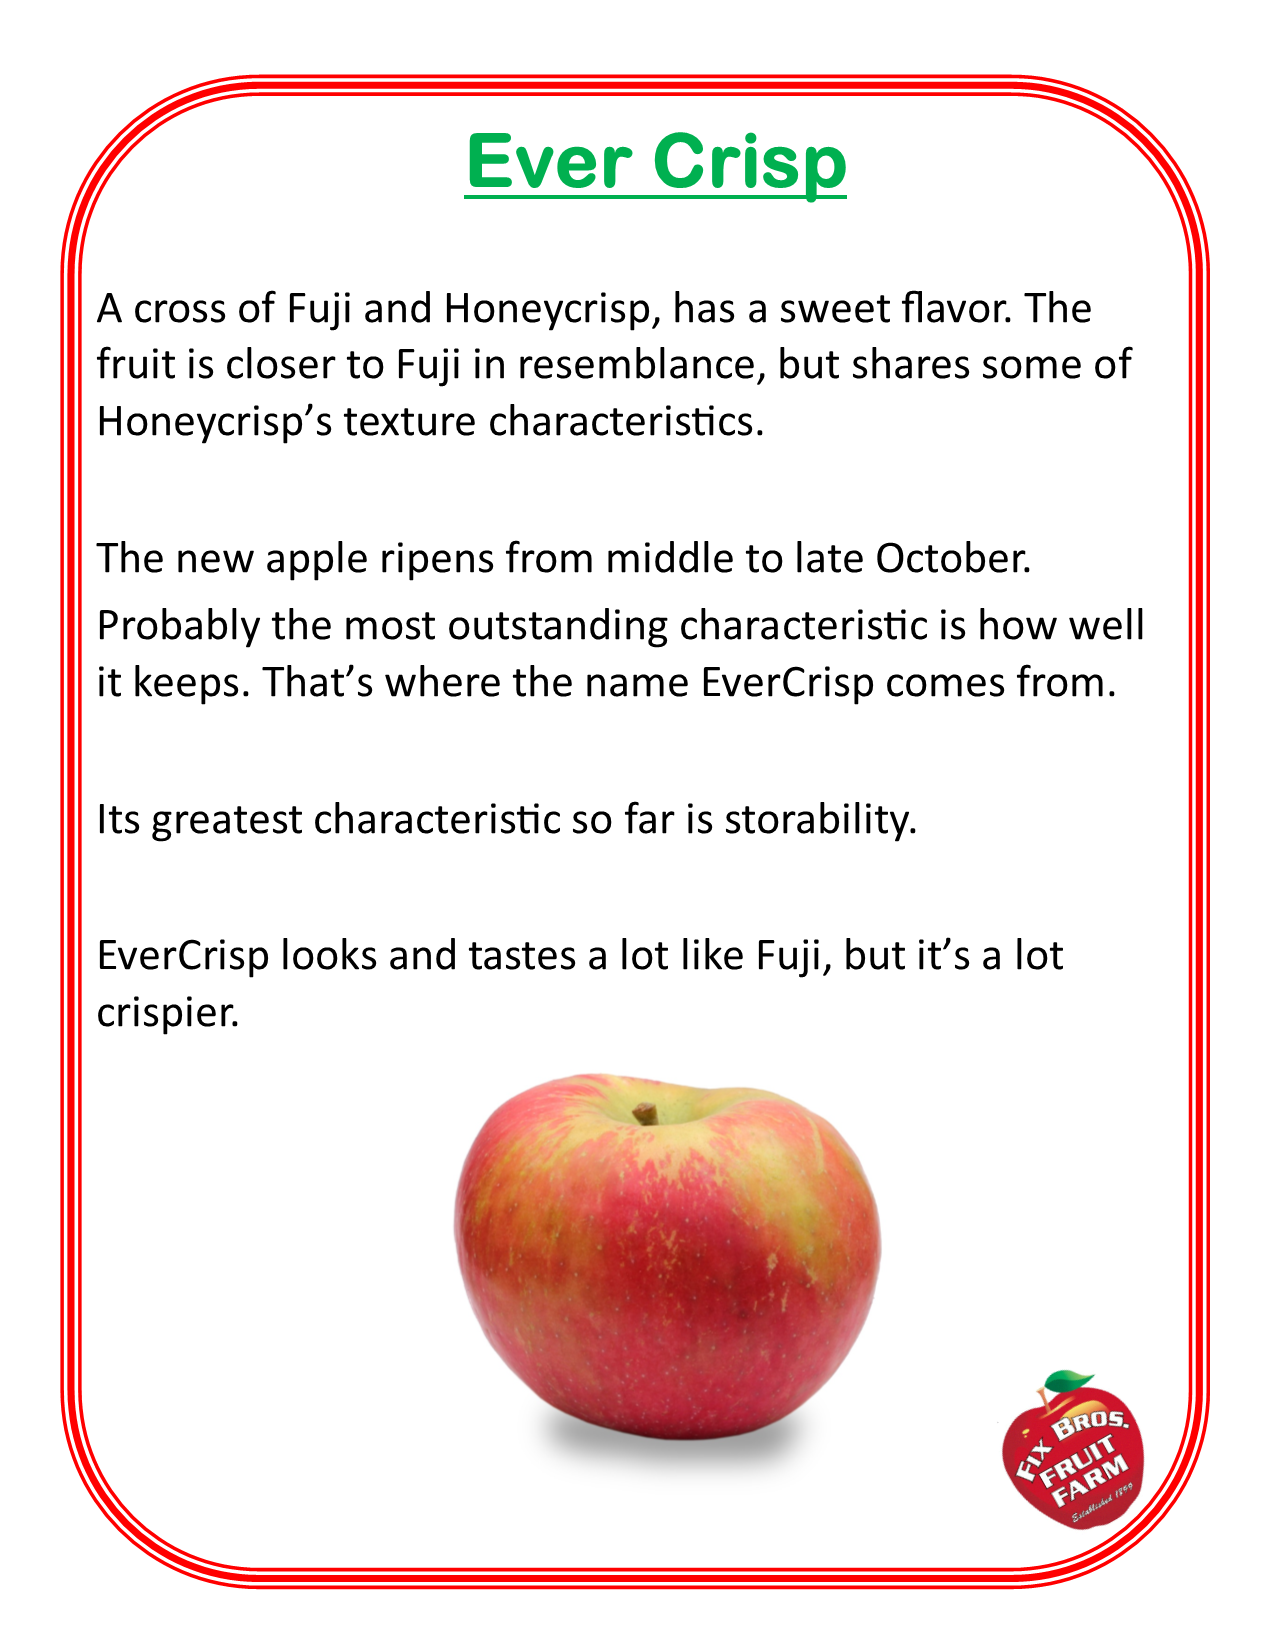 Ever Crisp apple grown at Fix Bros Fruit Farm, Hudson, New York